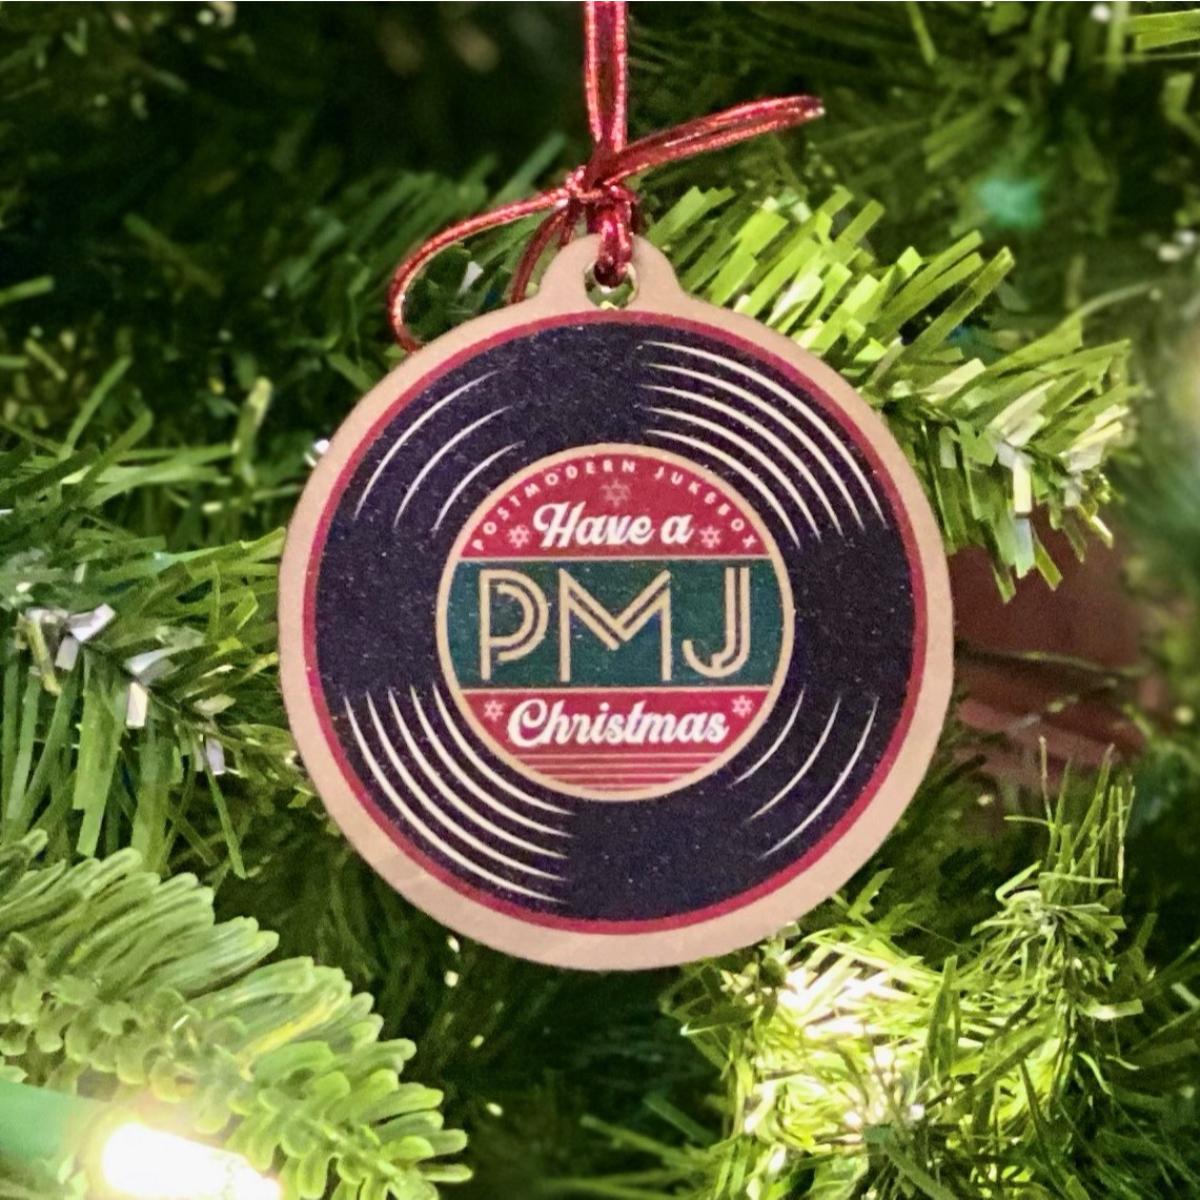 PMJ Ornament